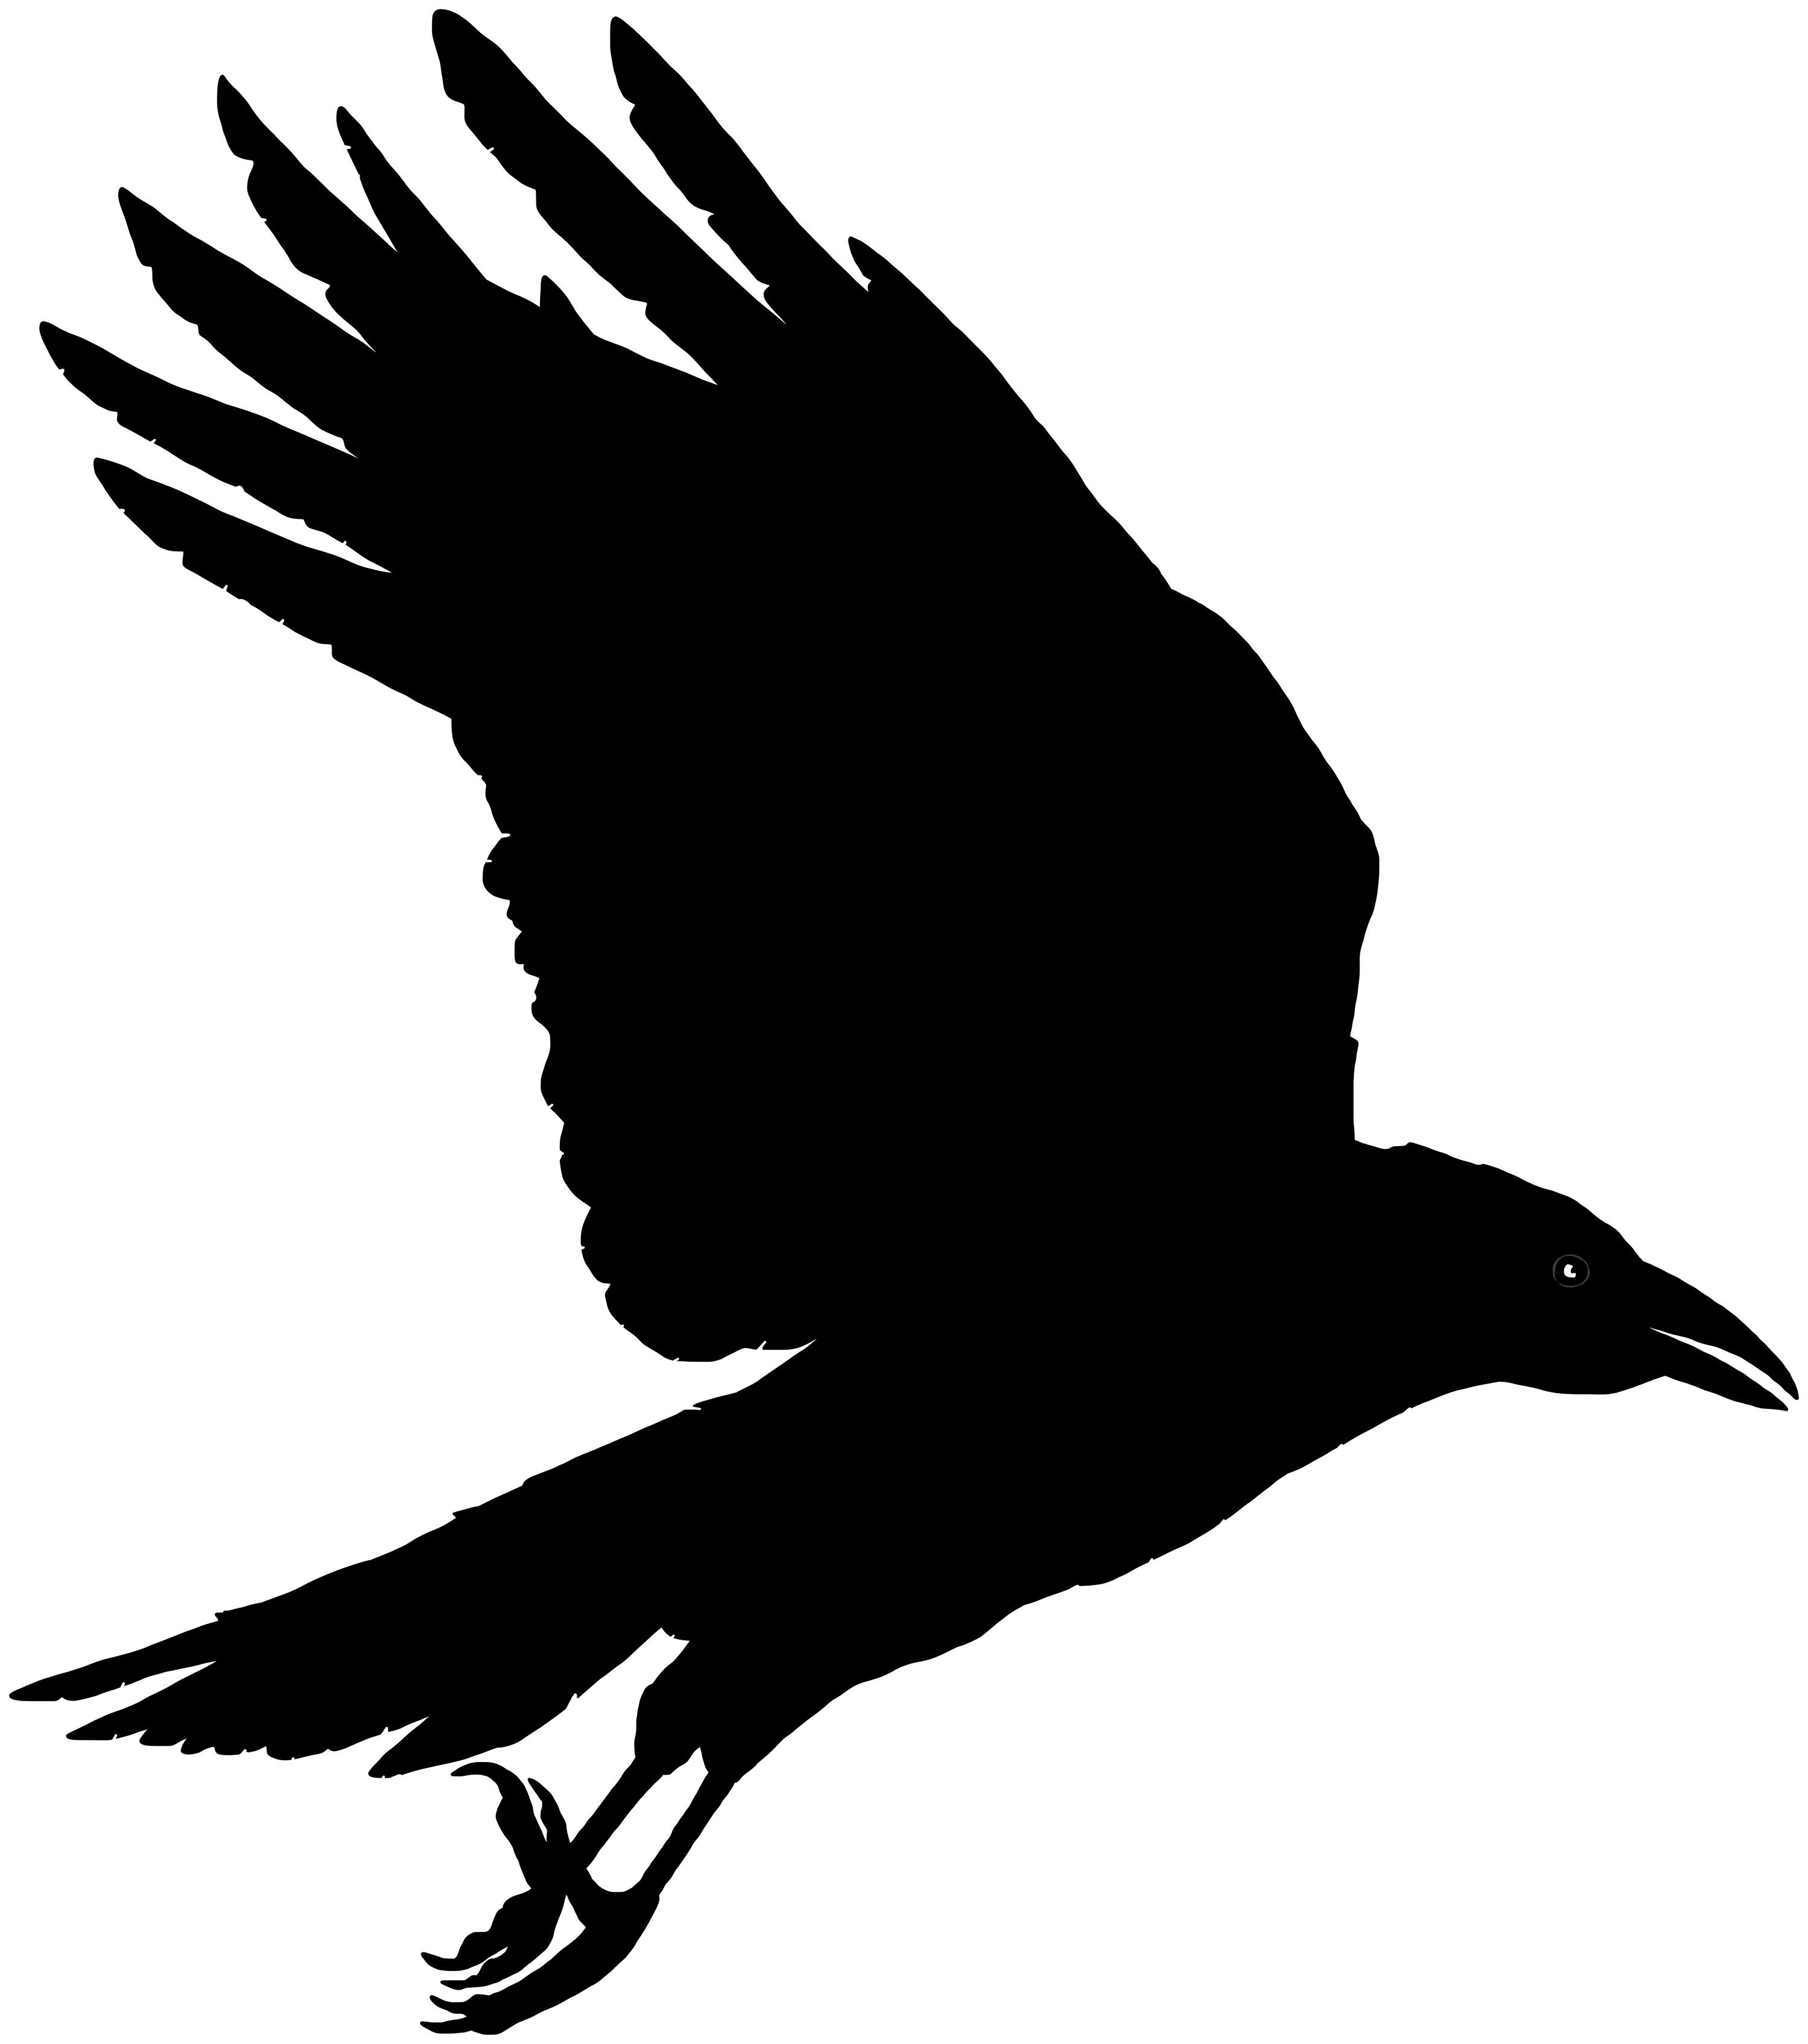 corvus phil openshaw clip art ravens printables. Black Bedroom Furniture Sets. Home Design Ideas